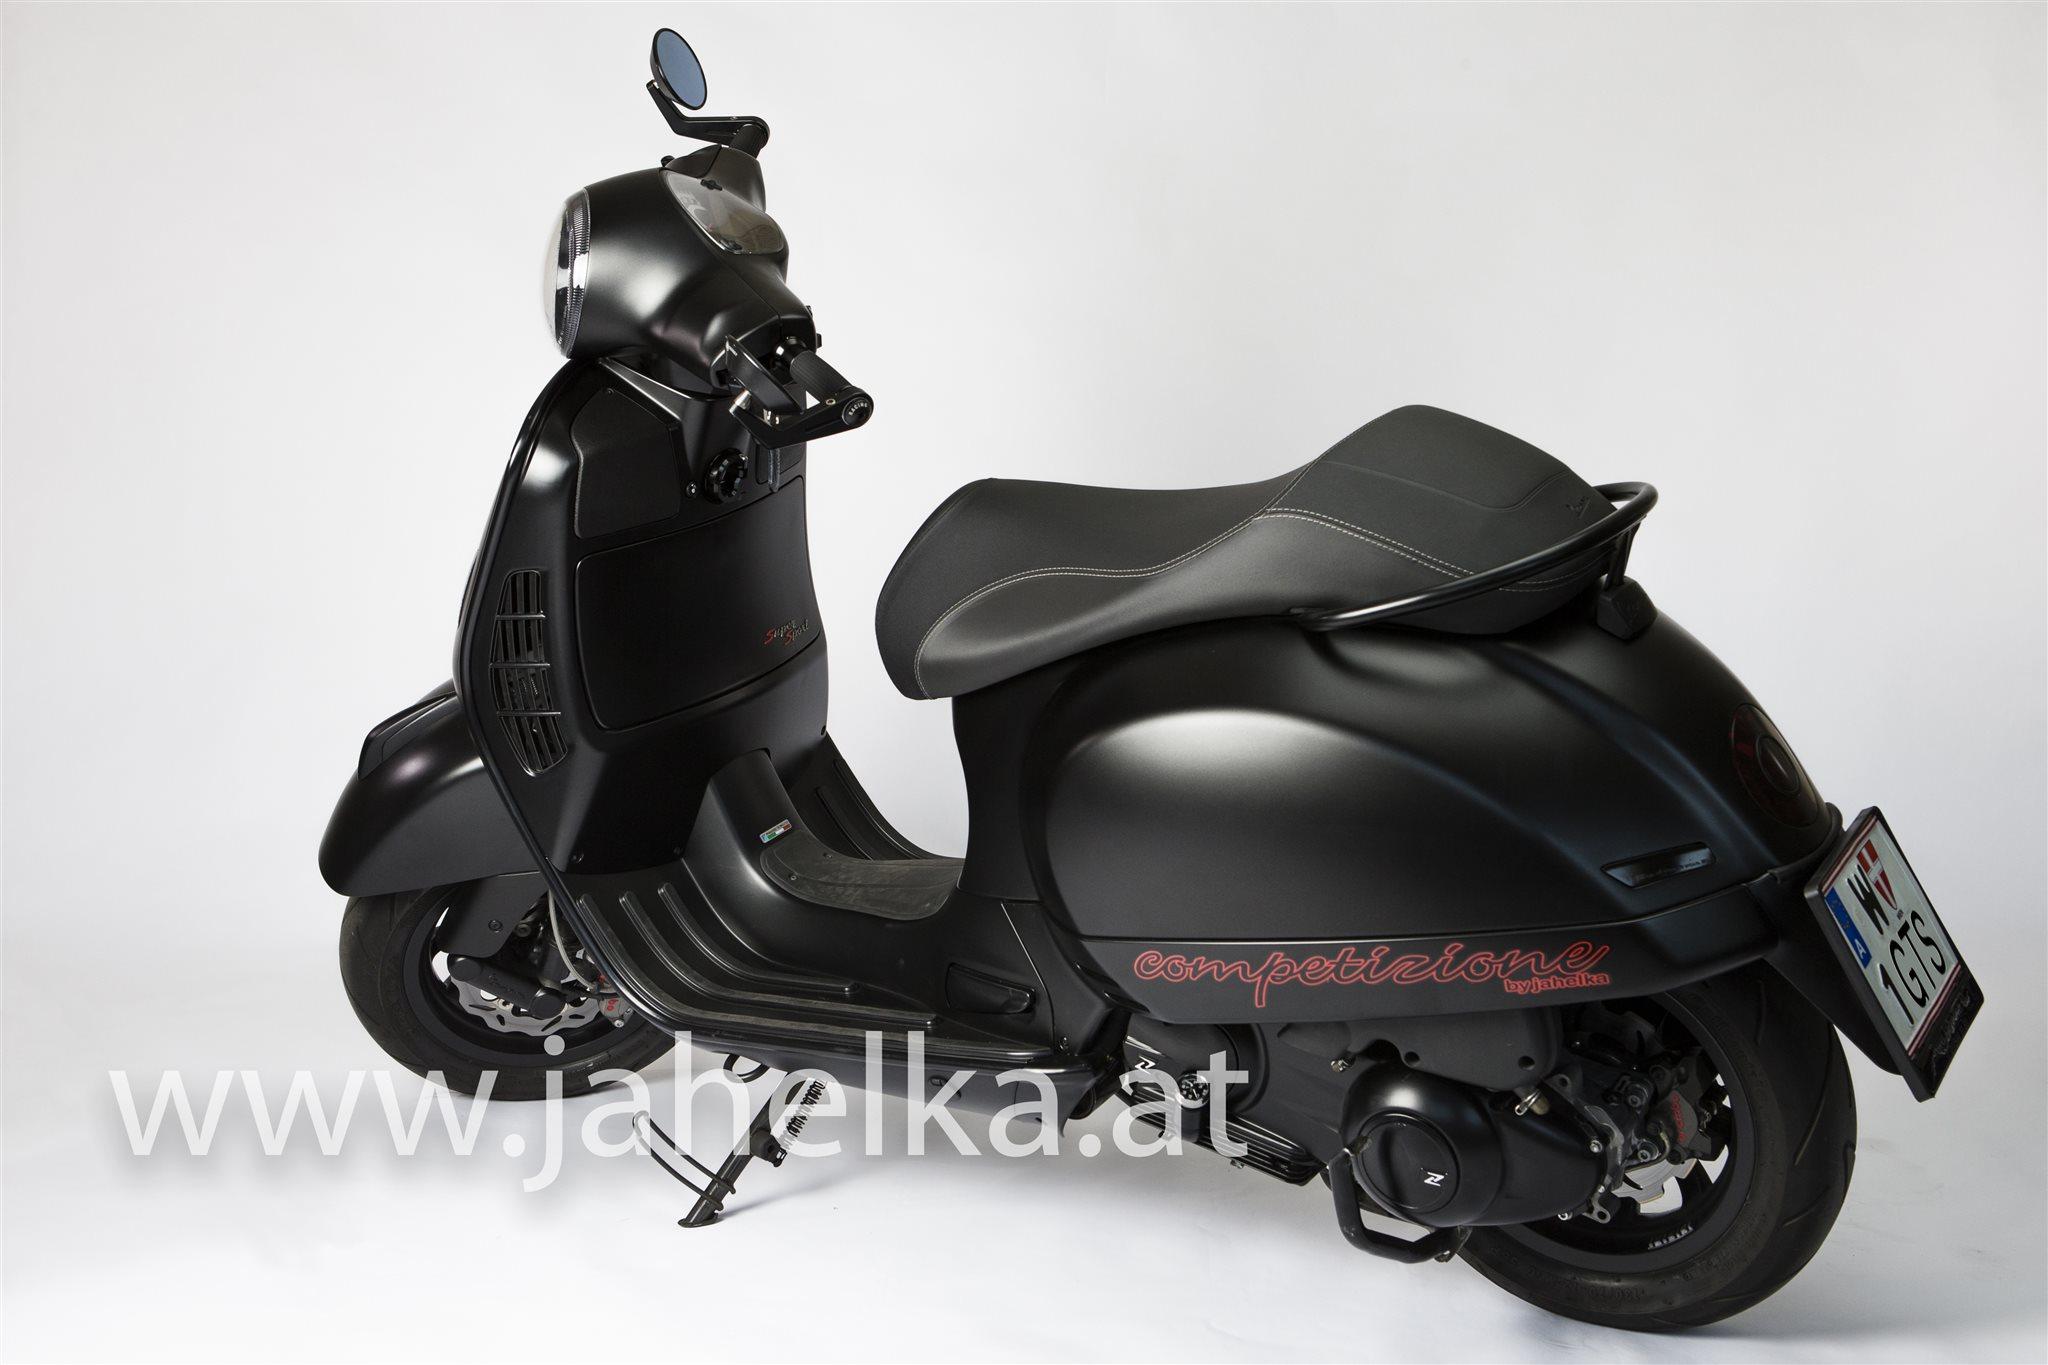 Details Zum Custom Bike Vespa Gts 300 I E Super Sport Des Handlers Jahelka Zweirad Gmbh Co Kg